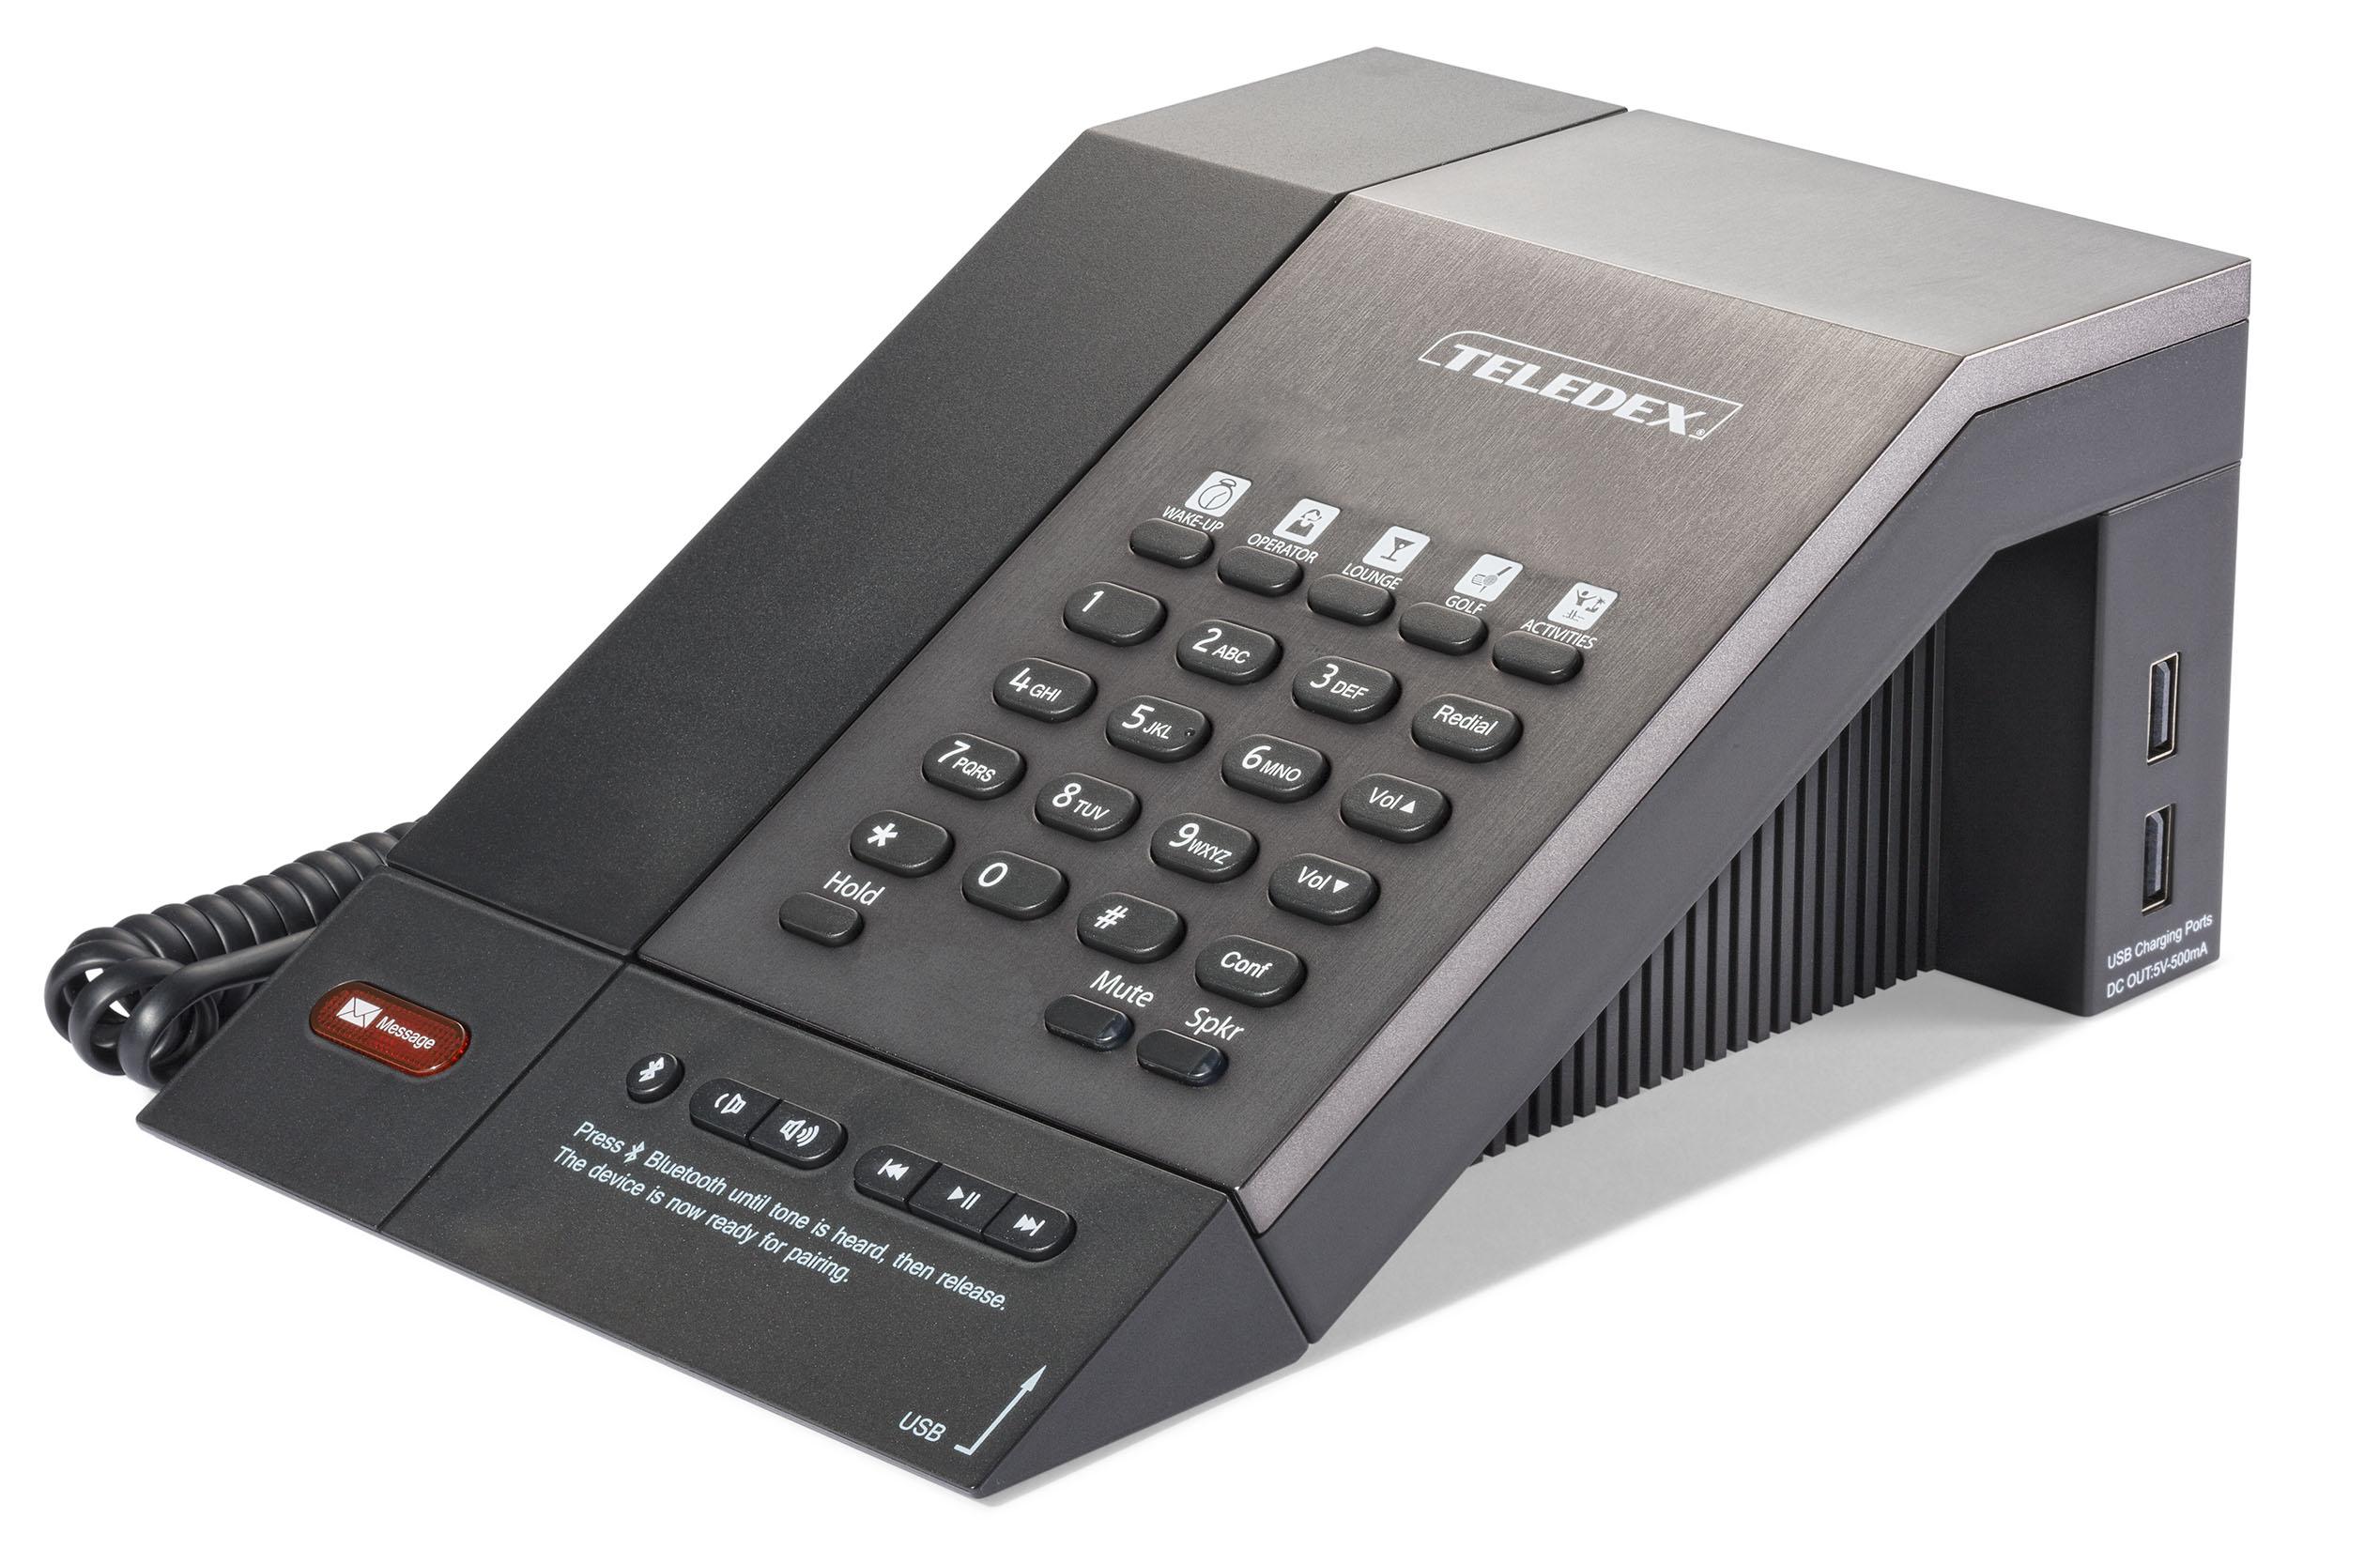 Teledex M series Bluetooth